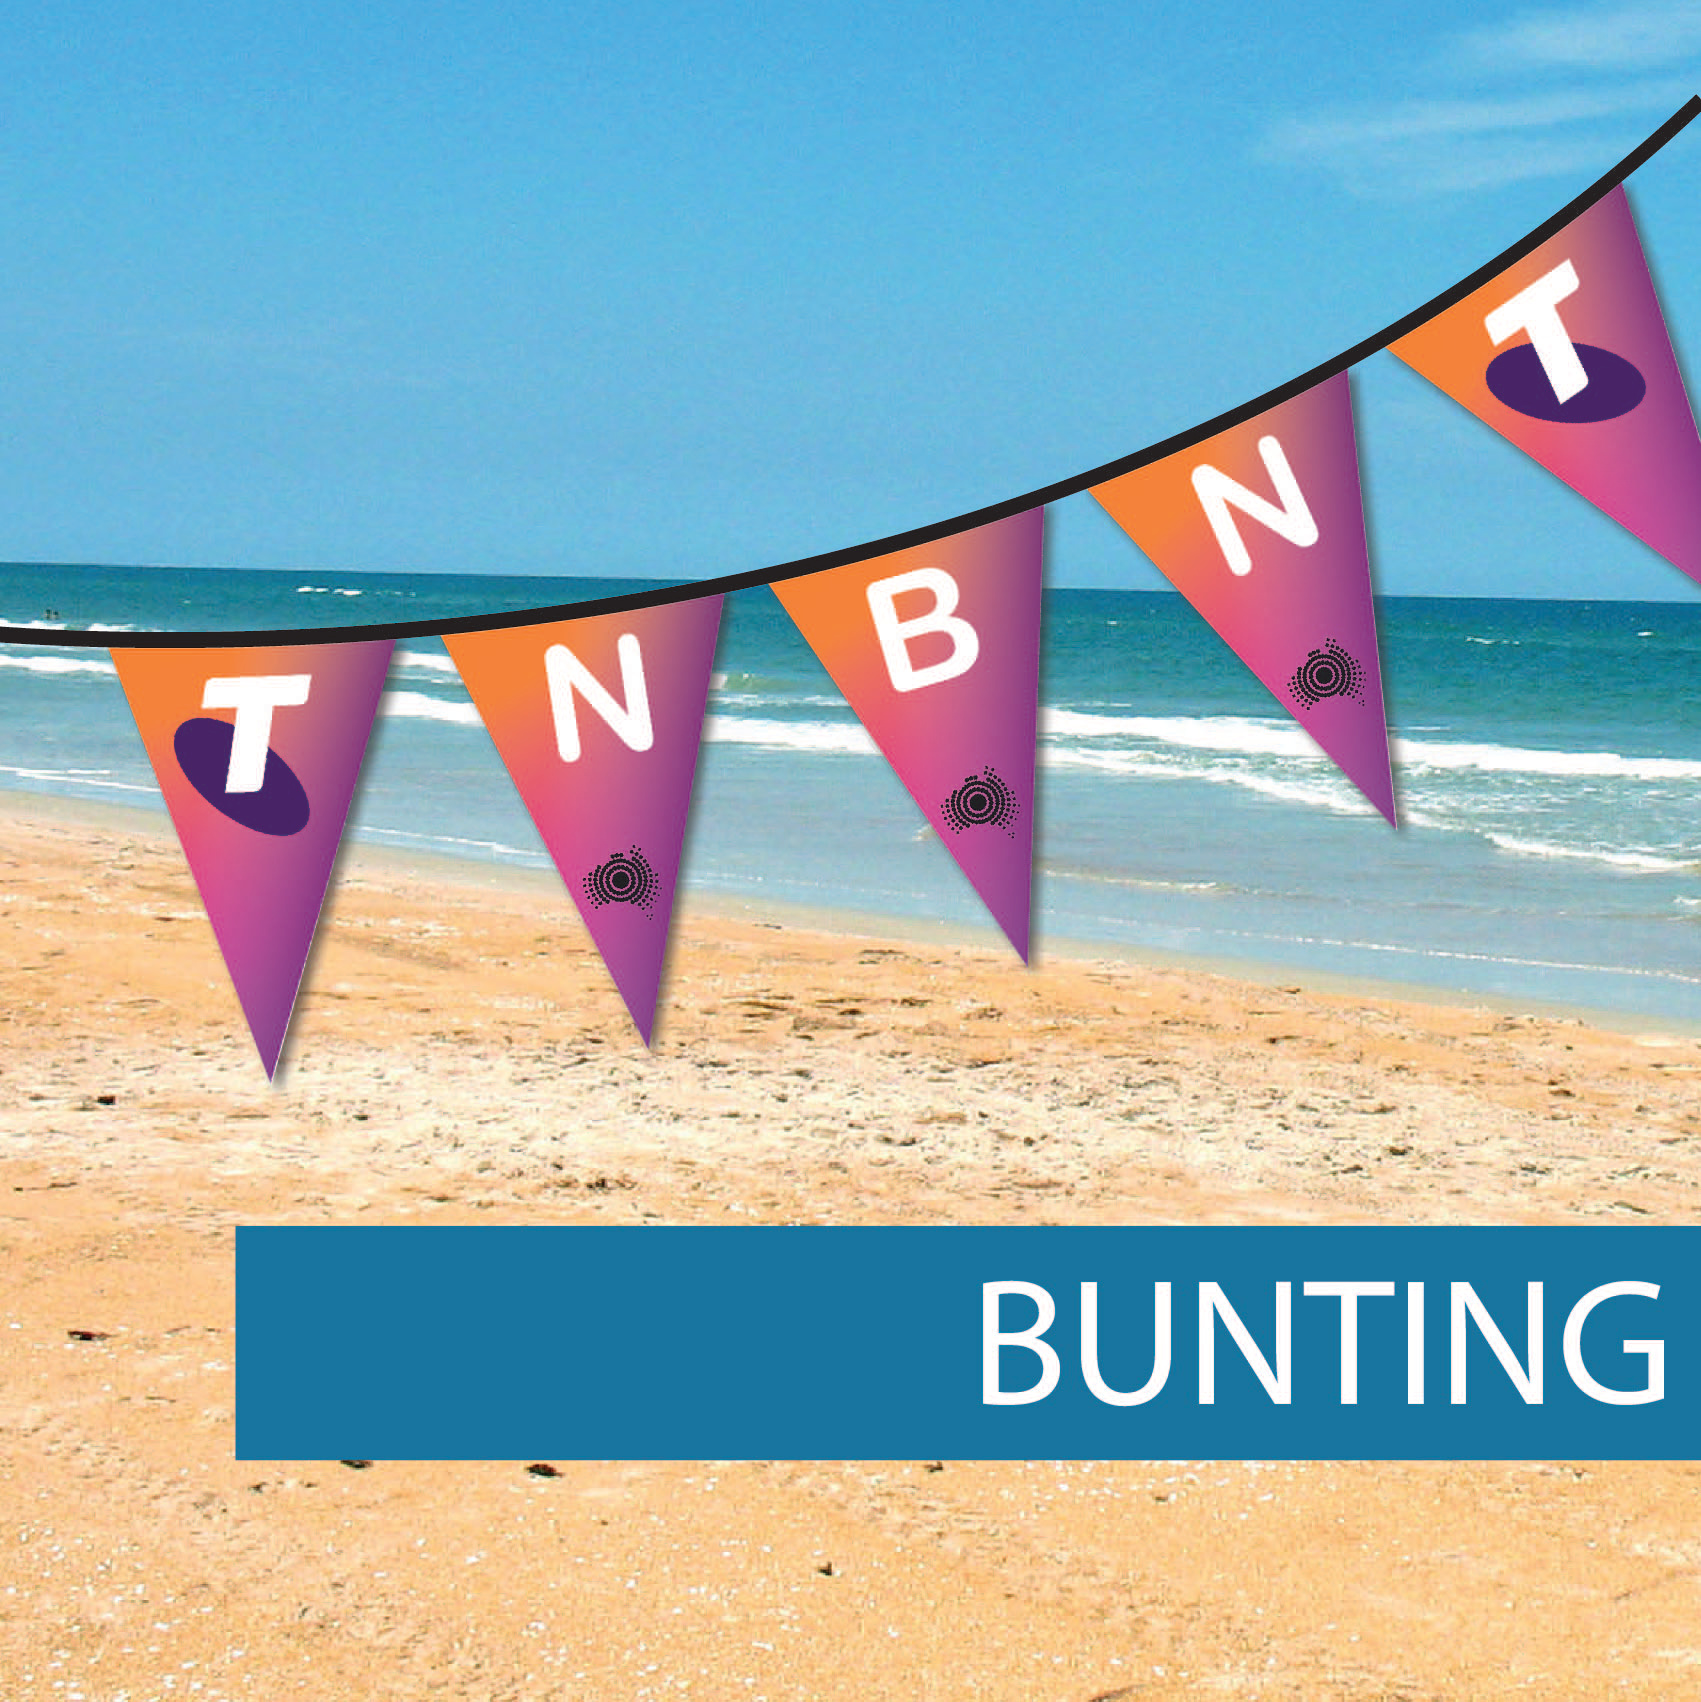 Bunting flags Australia